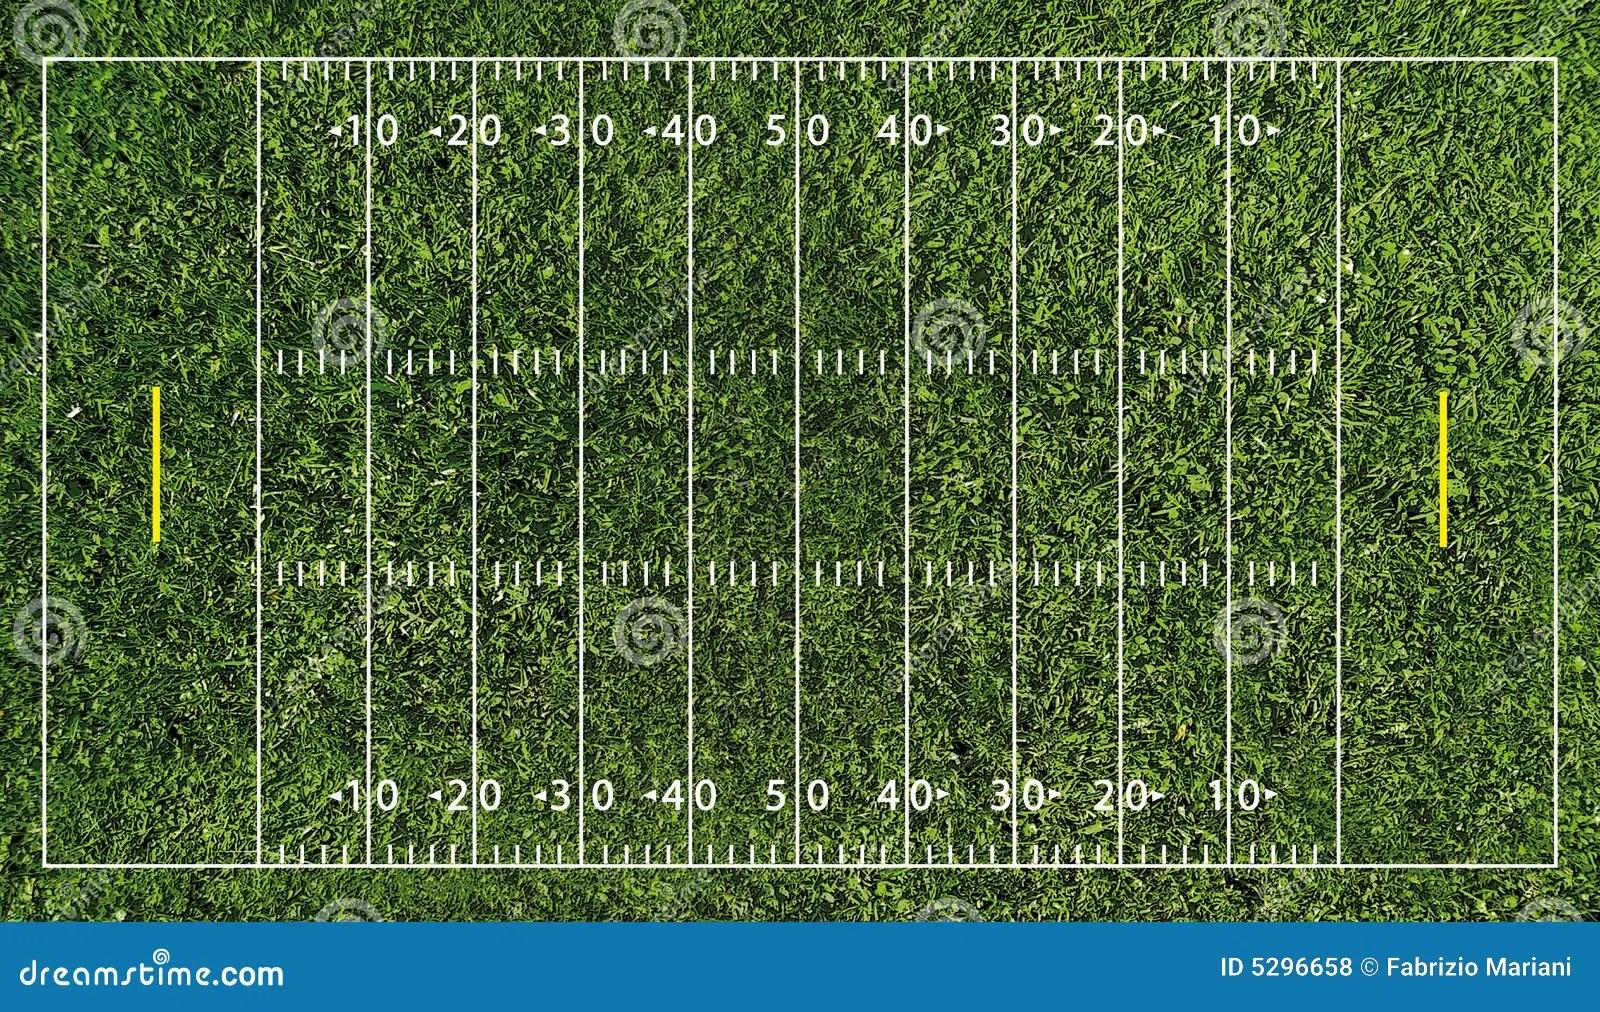 Nfl Football Field Diagram